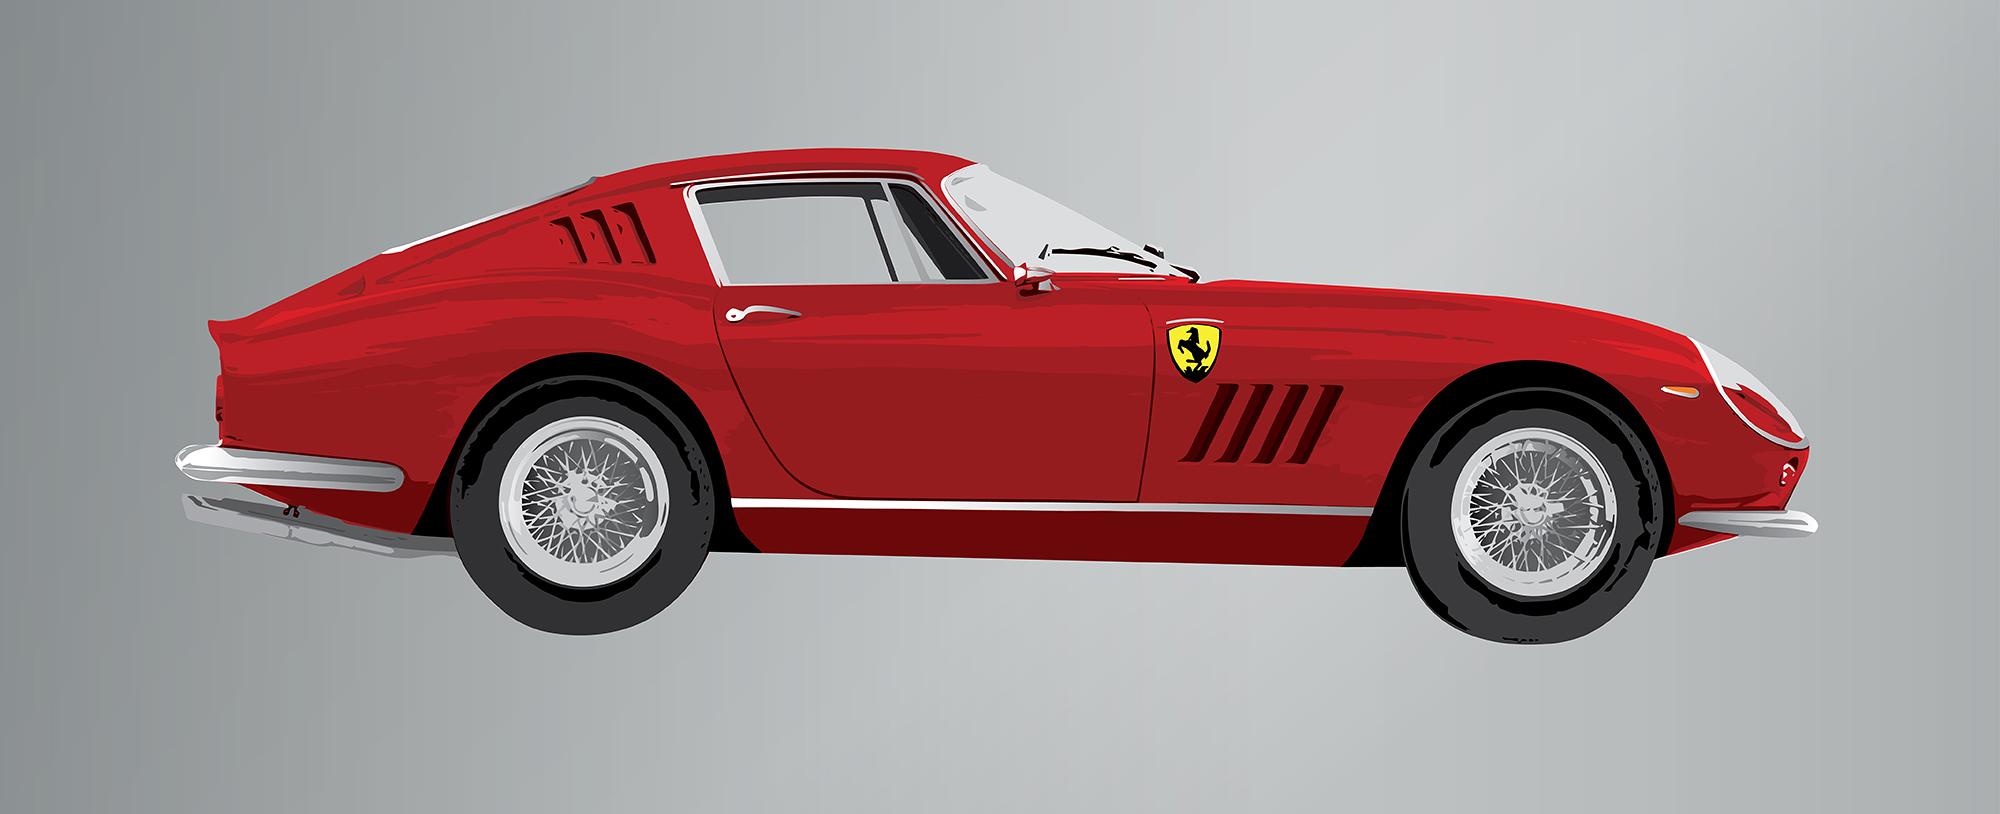 Wilton Classic Super Car Show